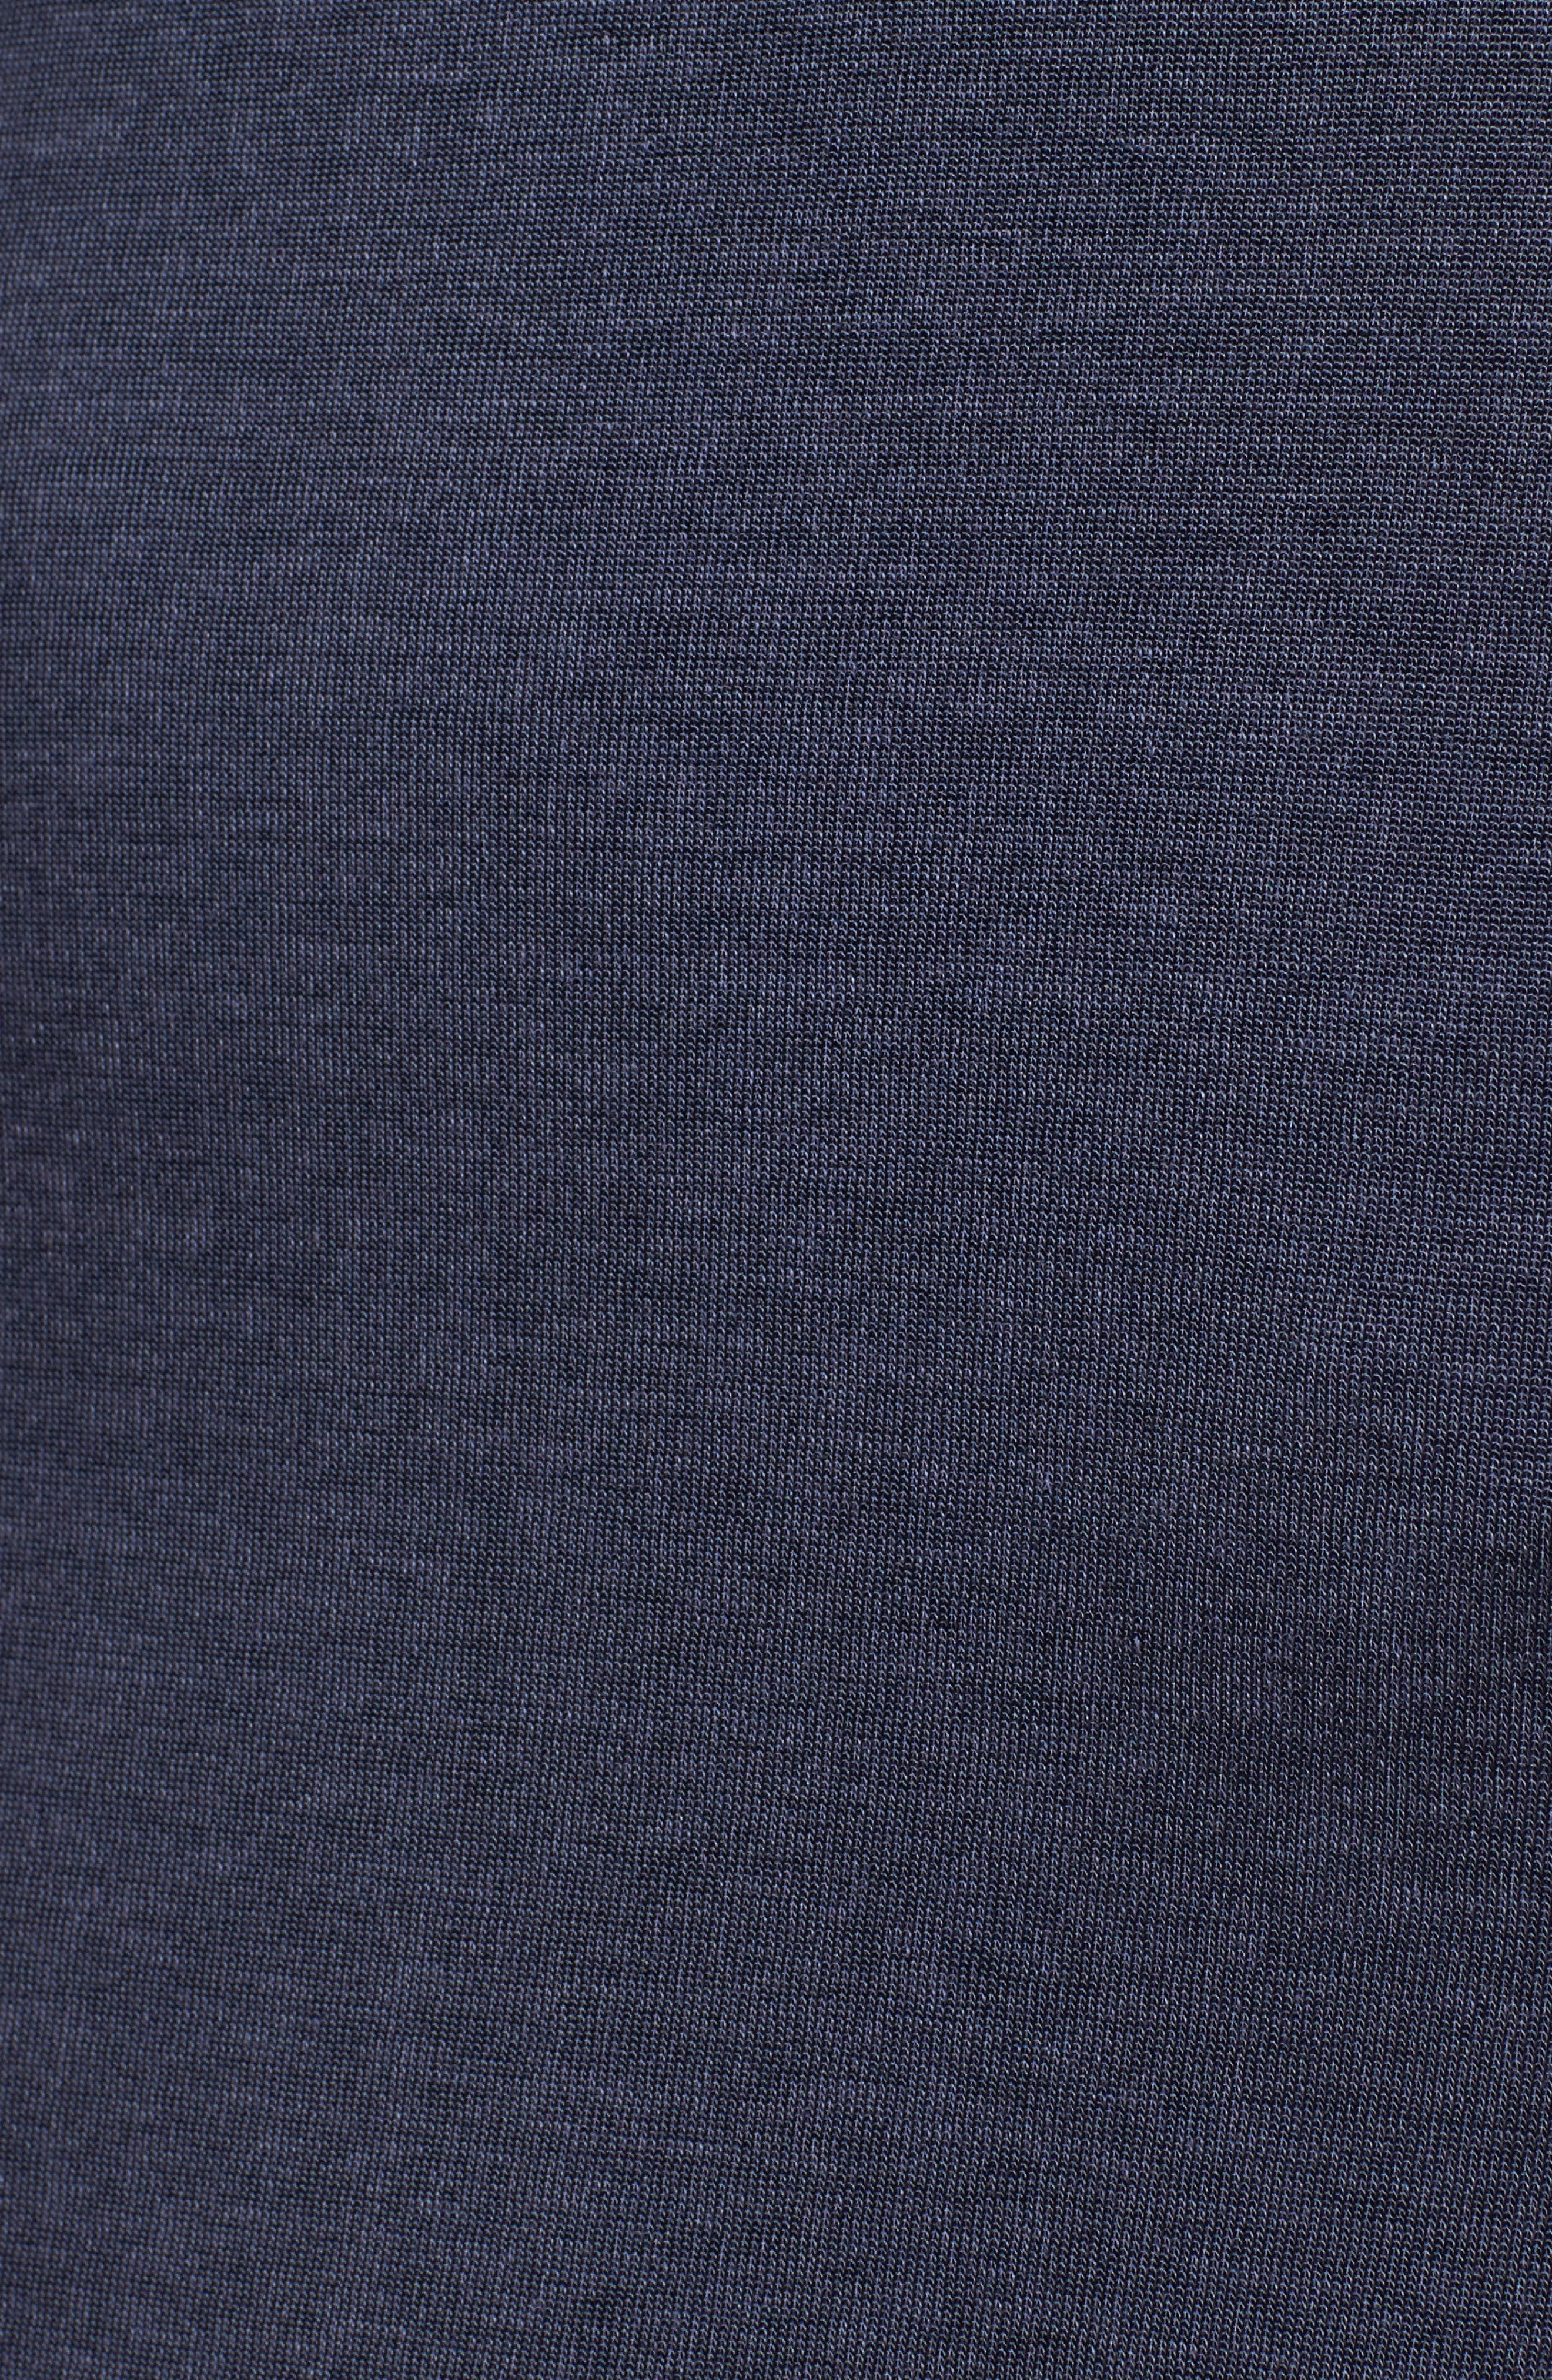 Dolostone Jersey Shift Dress,                             Alternate thumbnail 5, color,                             410